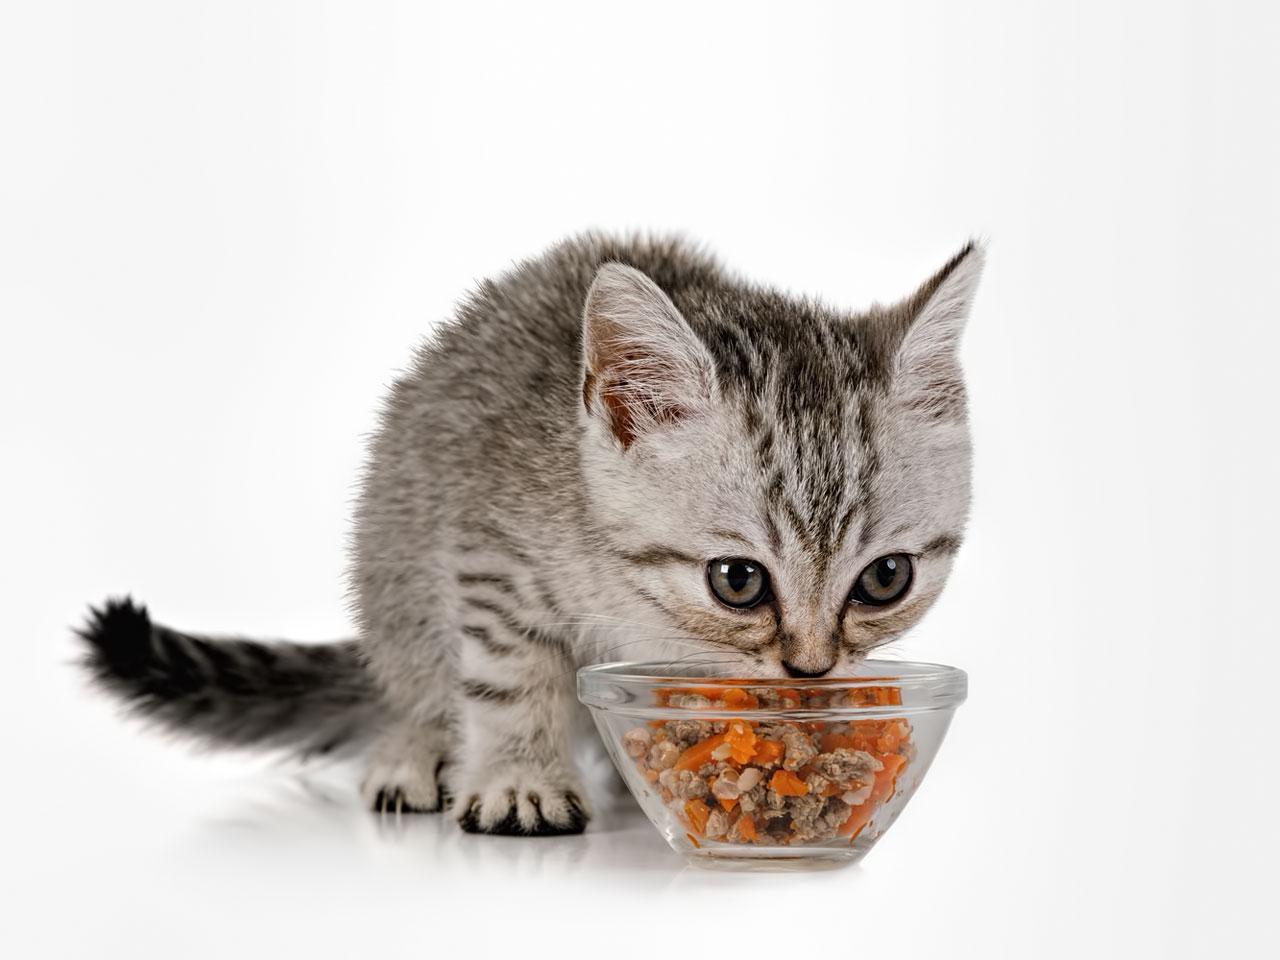 Katzenbaby frisst Kittenfutter